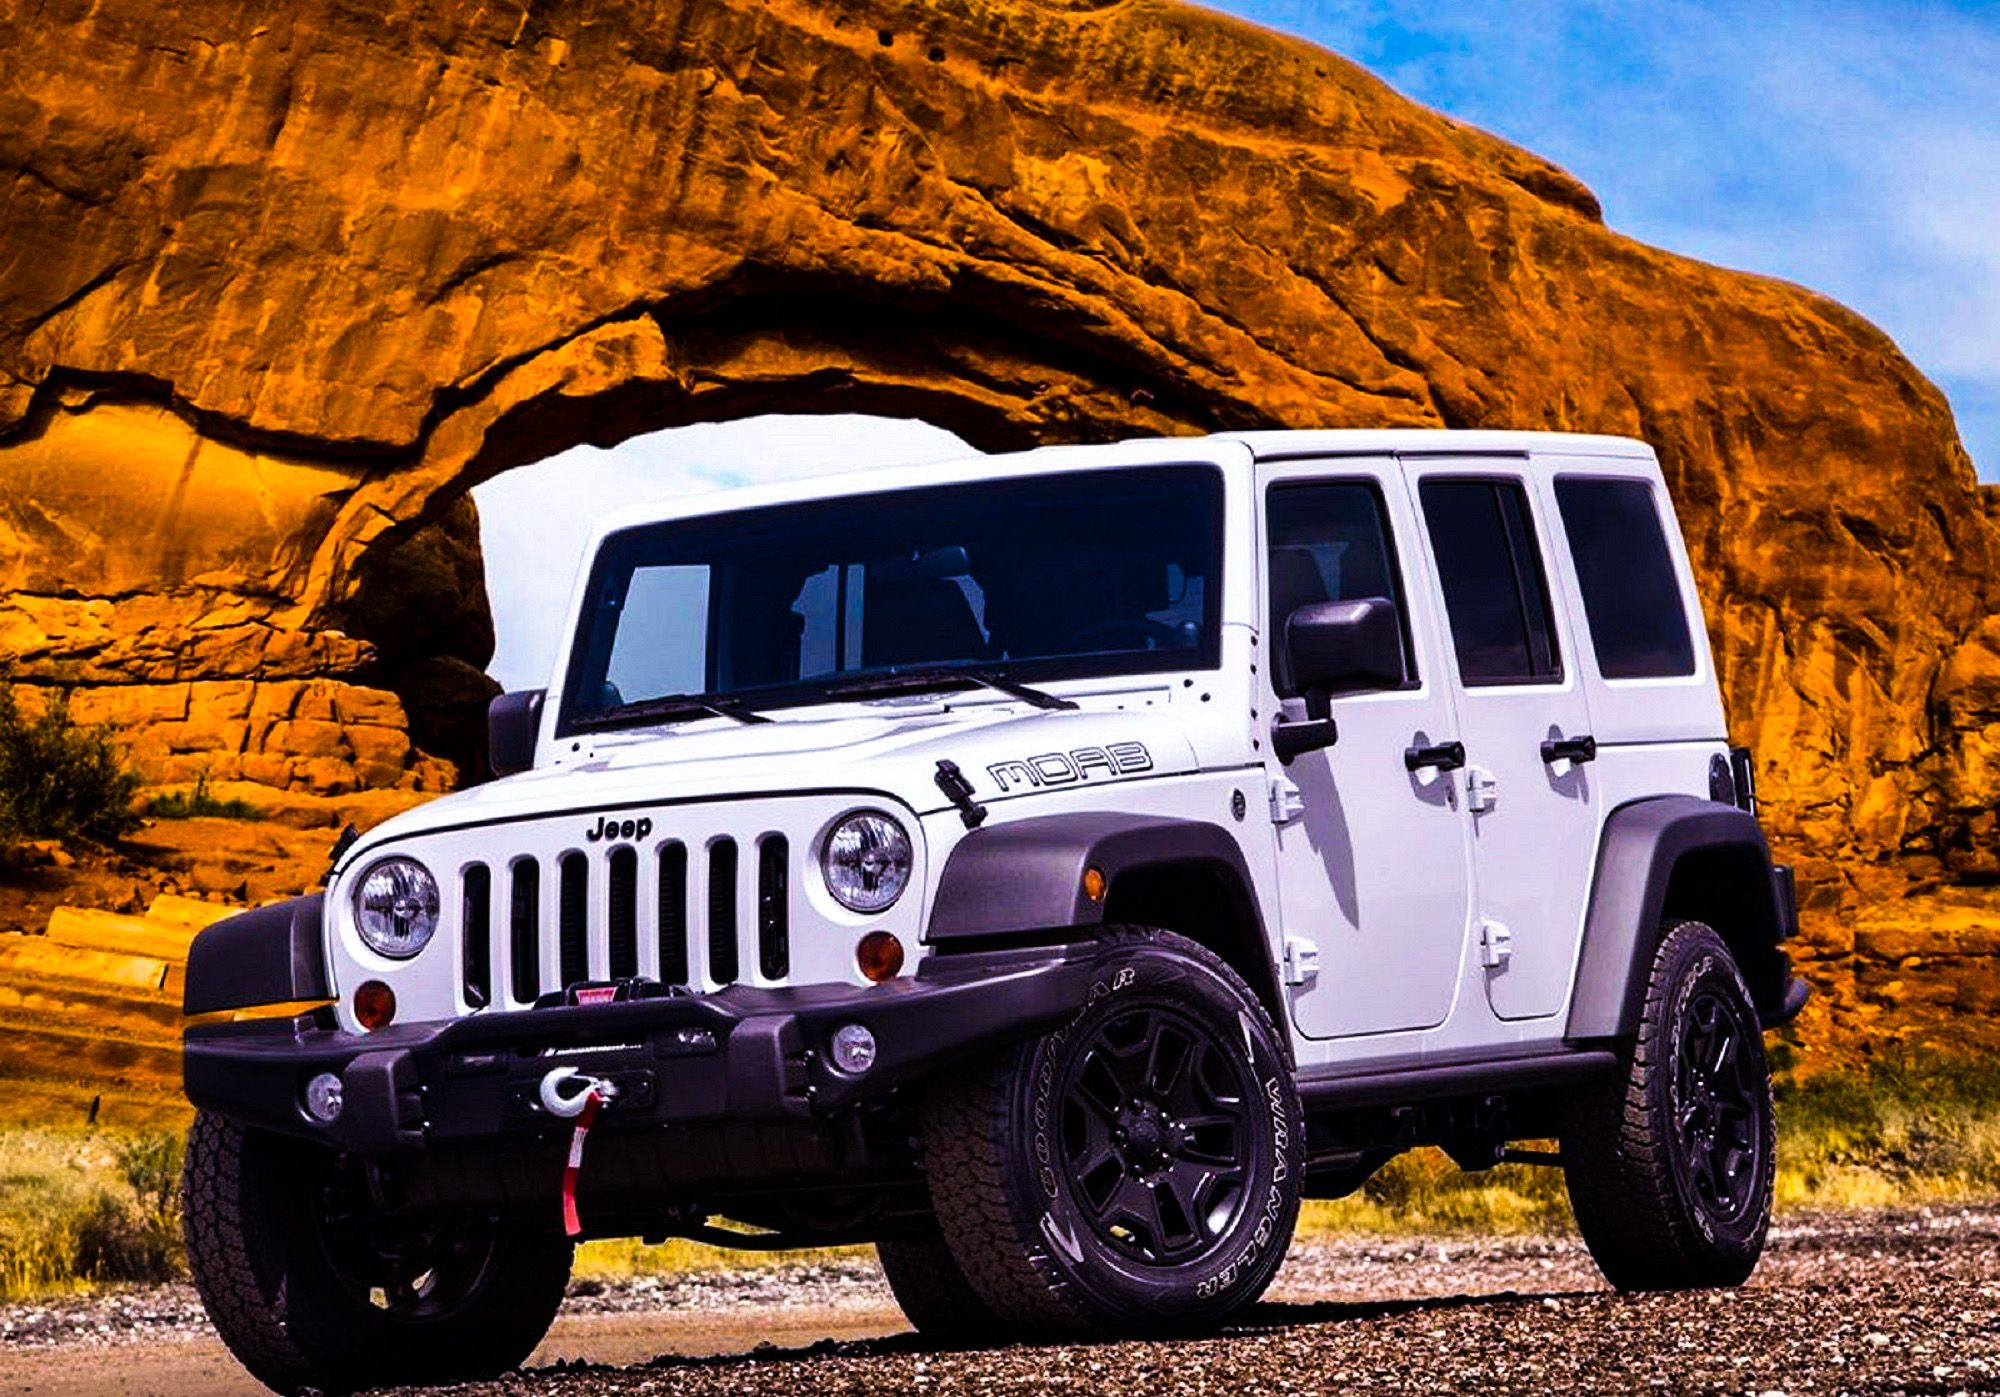 2014 White Jeep Wrangler Diesel 4 Door Moab Jeep